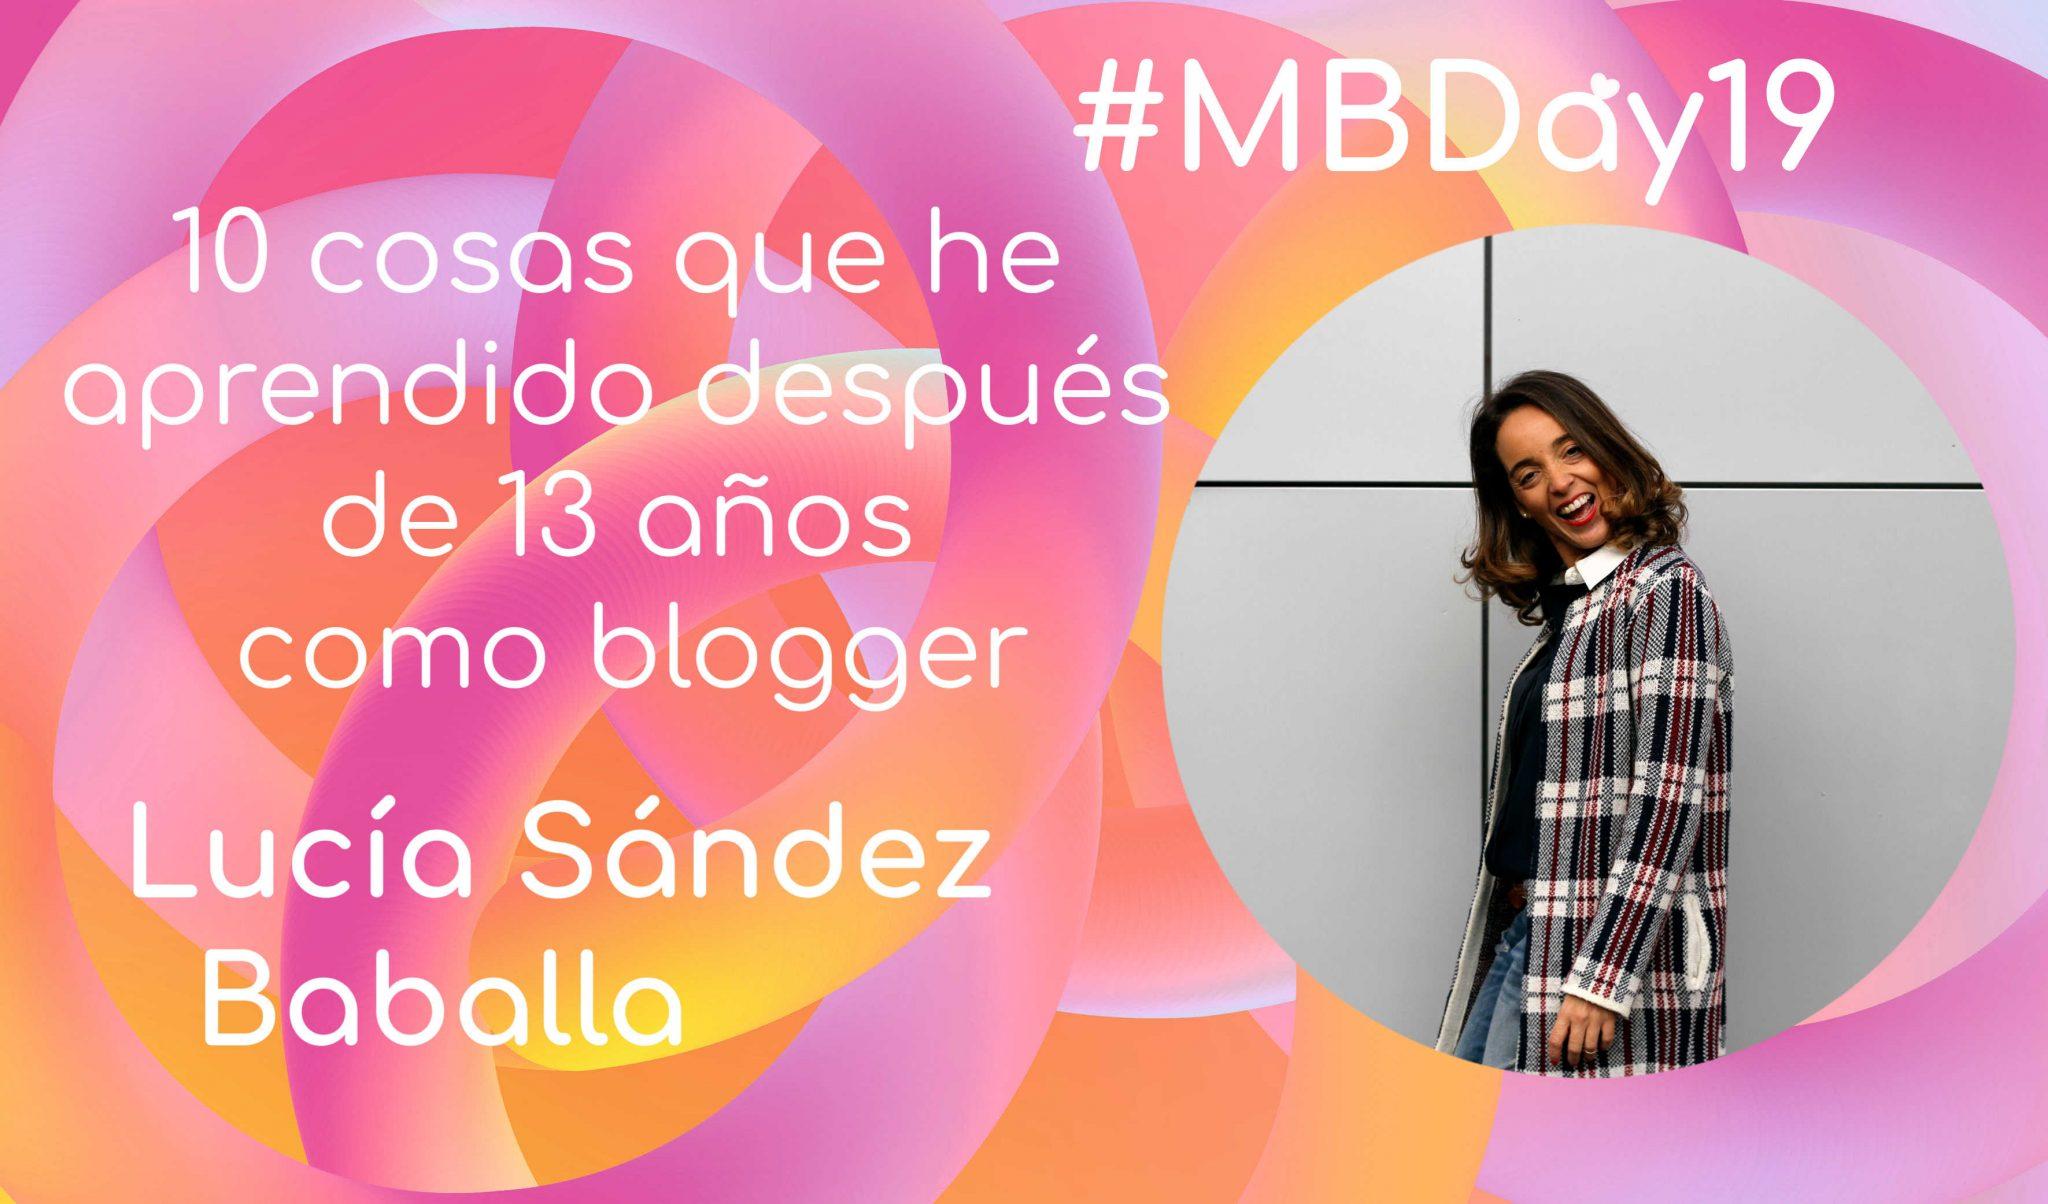 Ponencias  Mbday19  10 cosas que he aprendido después de 13 años como  blogger por Lucía Sández 441d2e5420d4